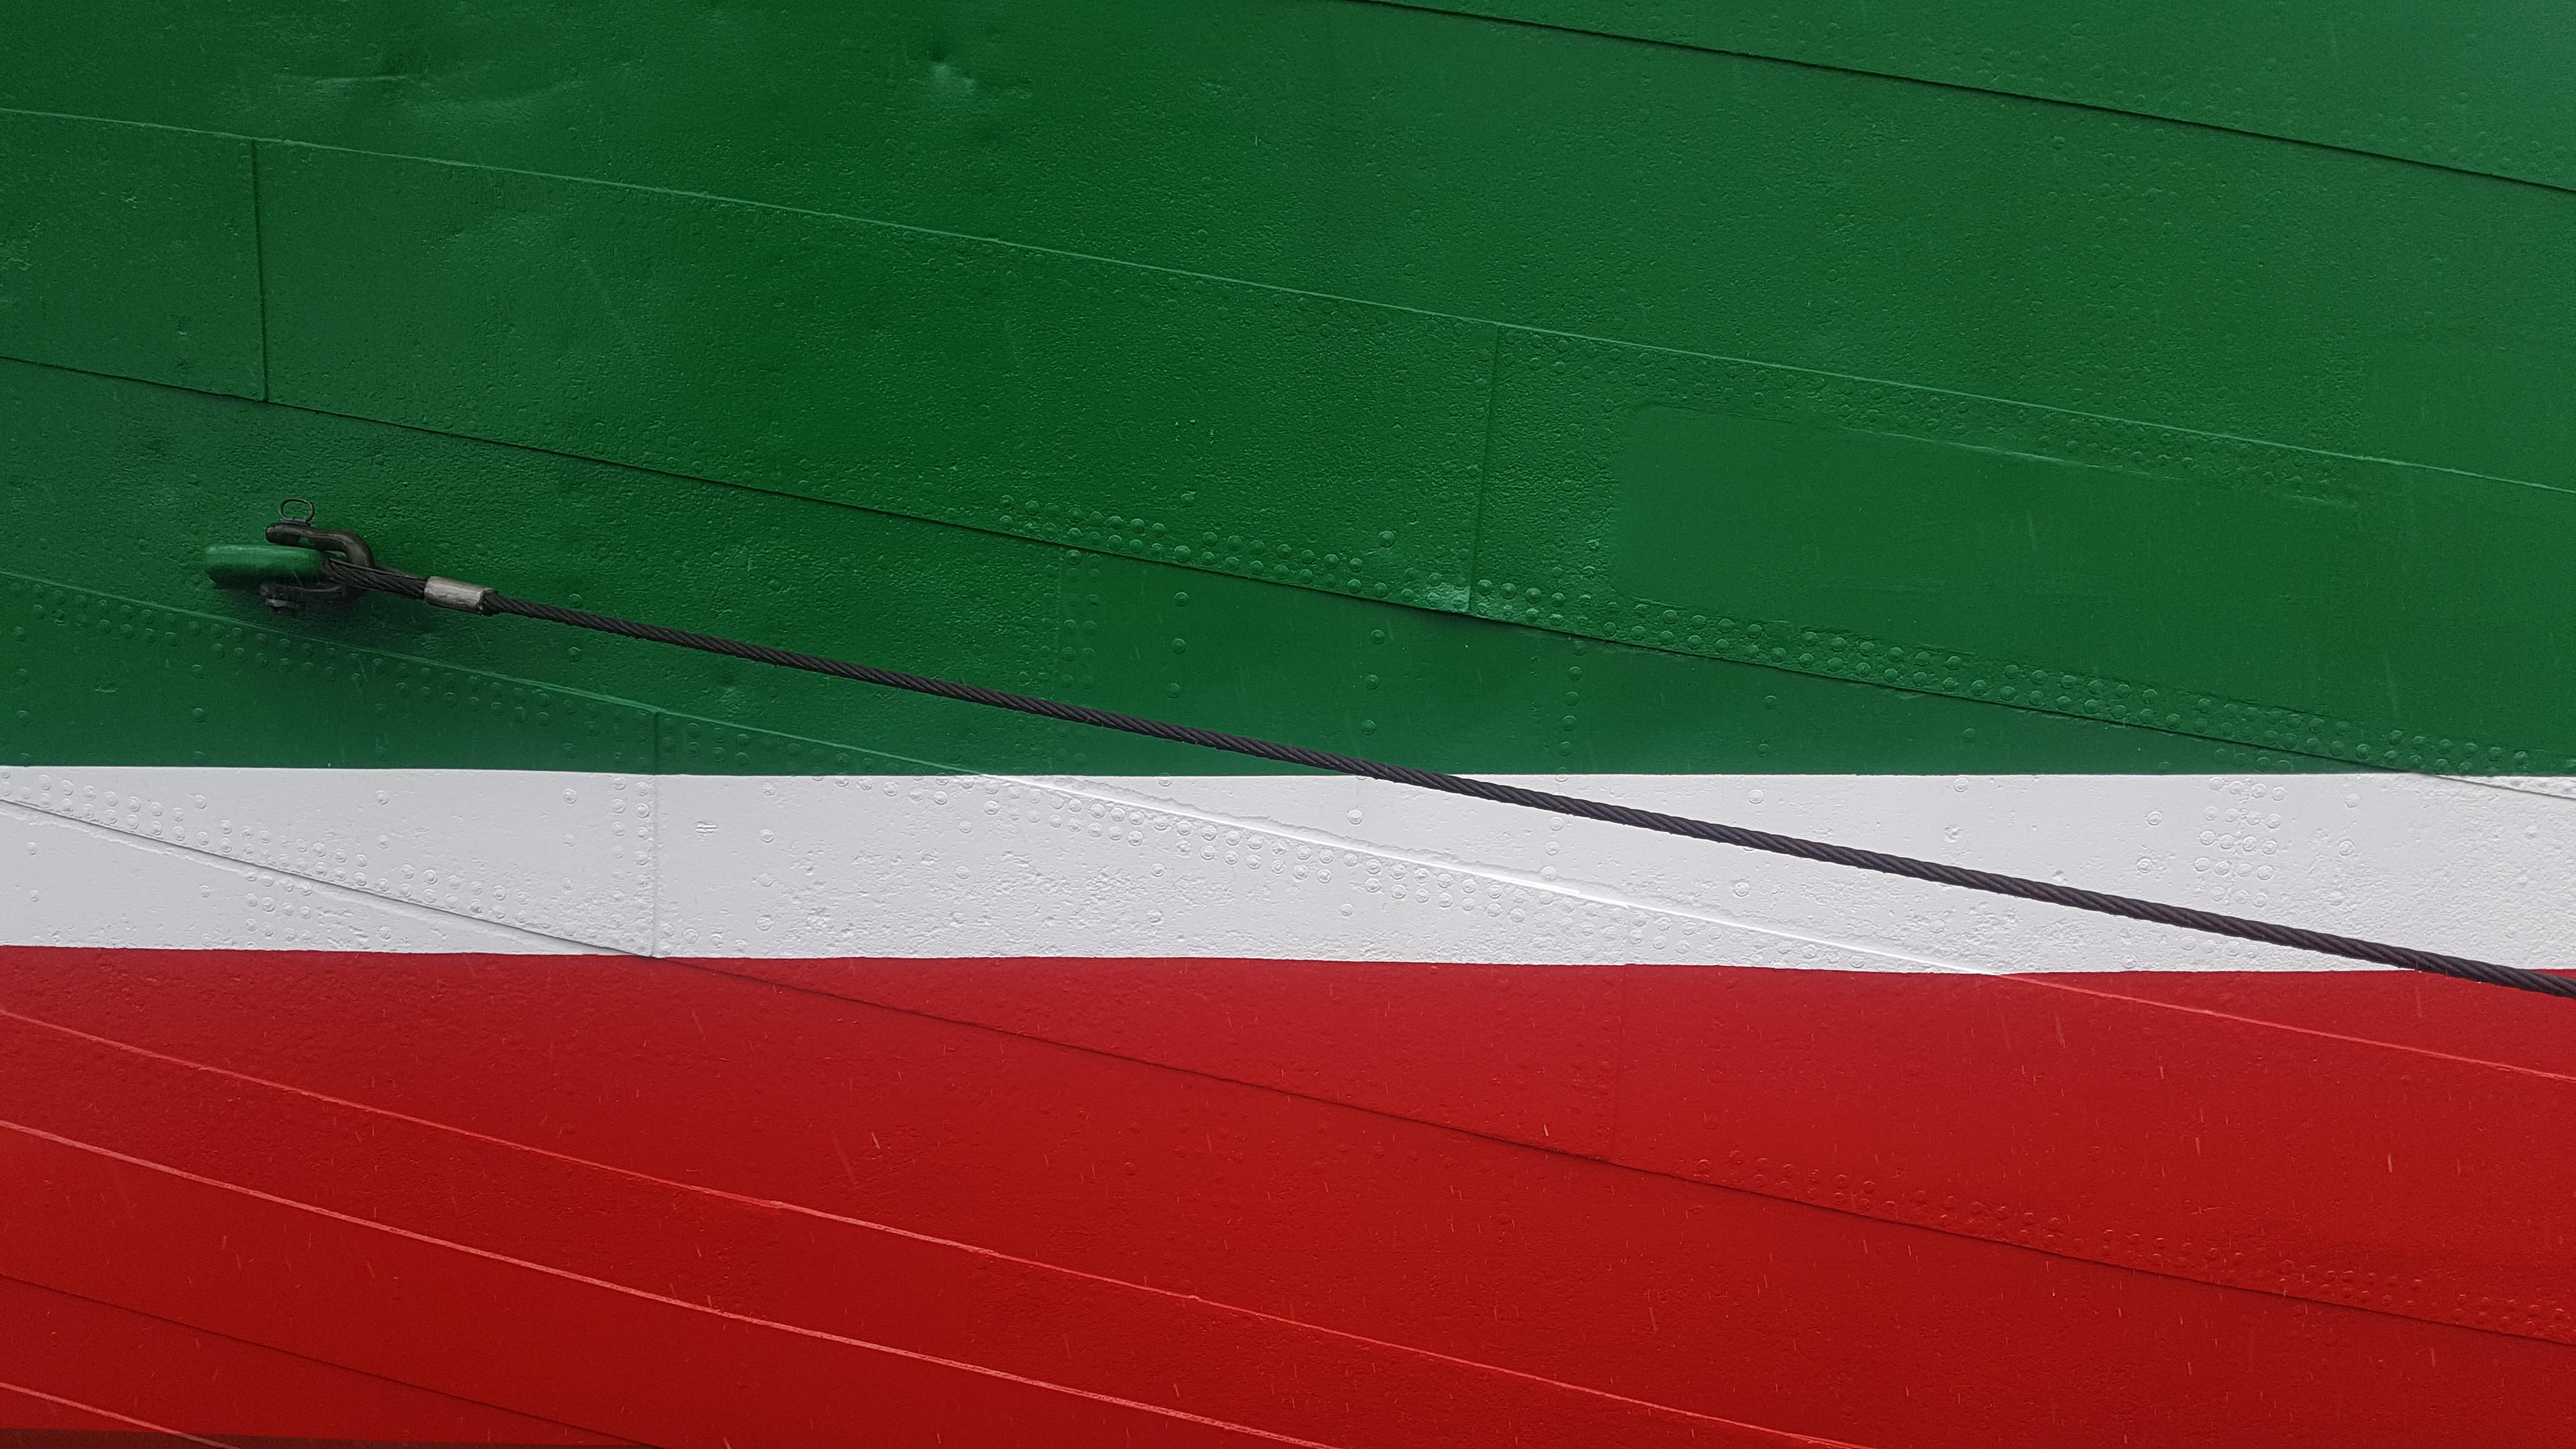 Hamburg, Landungsbrücken:  unverkennbar maritim: der grün-weiß-rote Rumpf des Museumschiffes RICKMER RICKMERS. Foto: Jenny May.